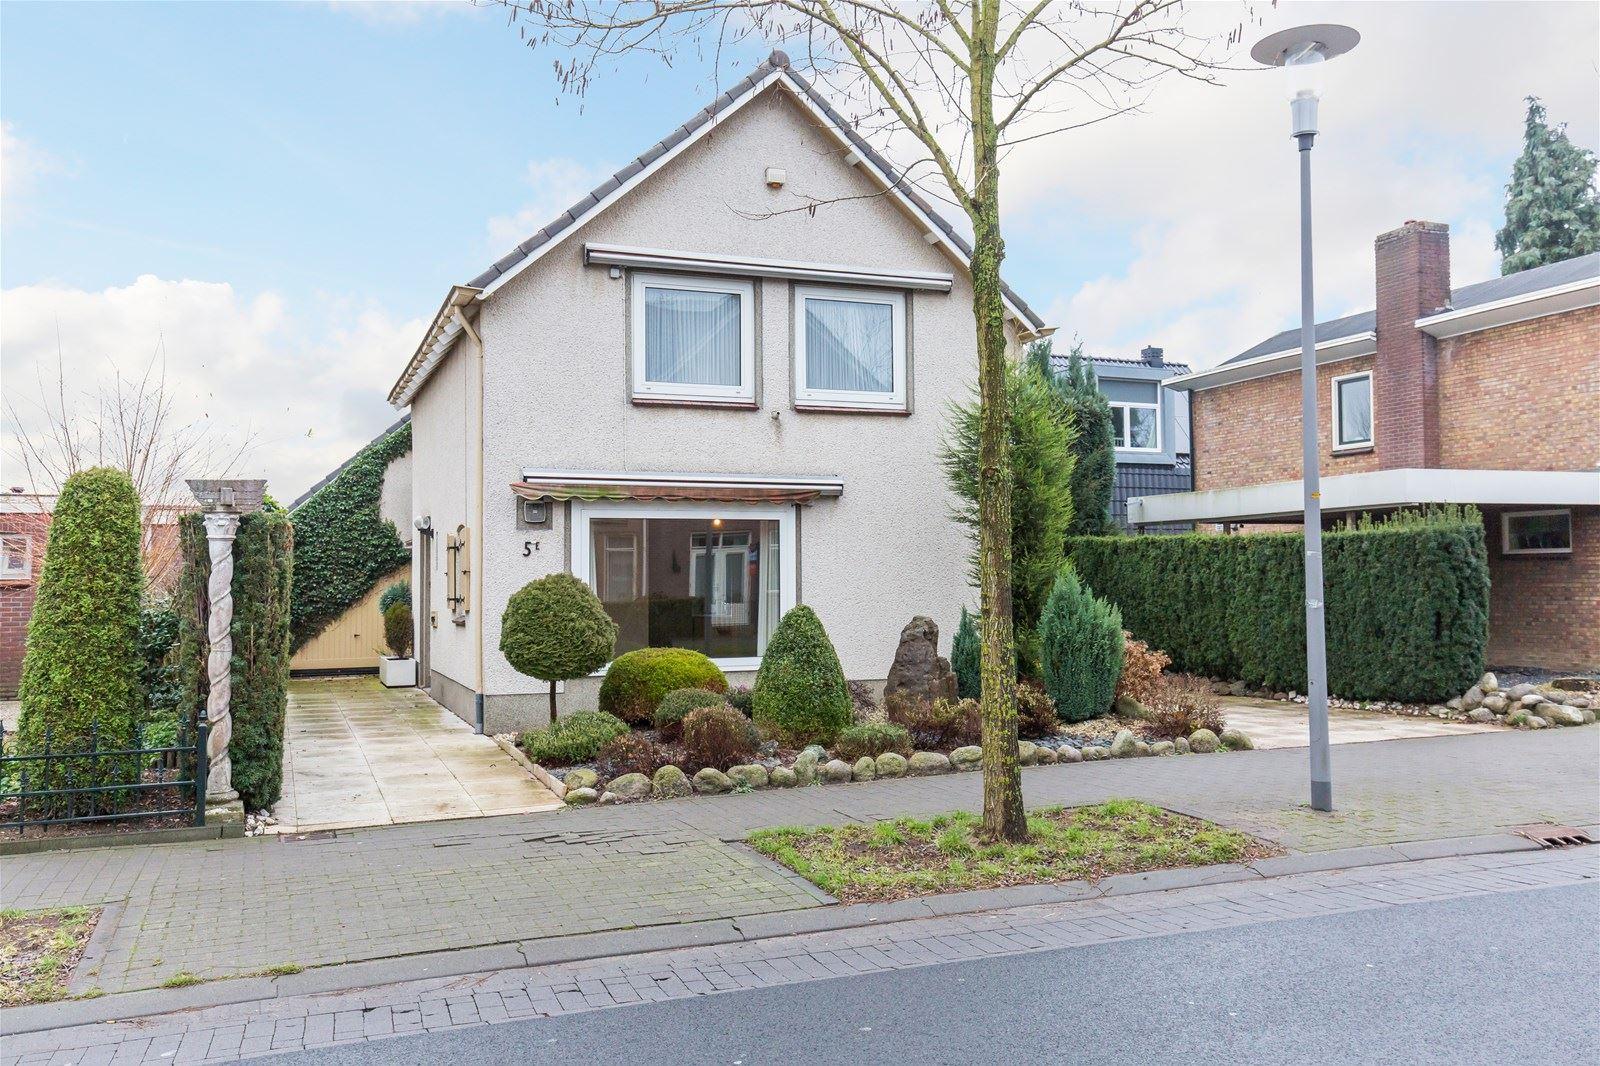 Huis te huur 39 s heerenbergseweg 5 e 7038 ca zeddam funda for Huis te huur in gelderland